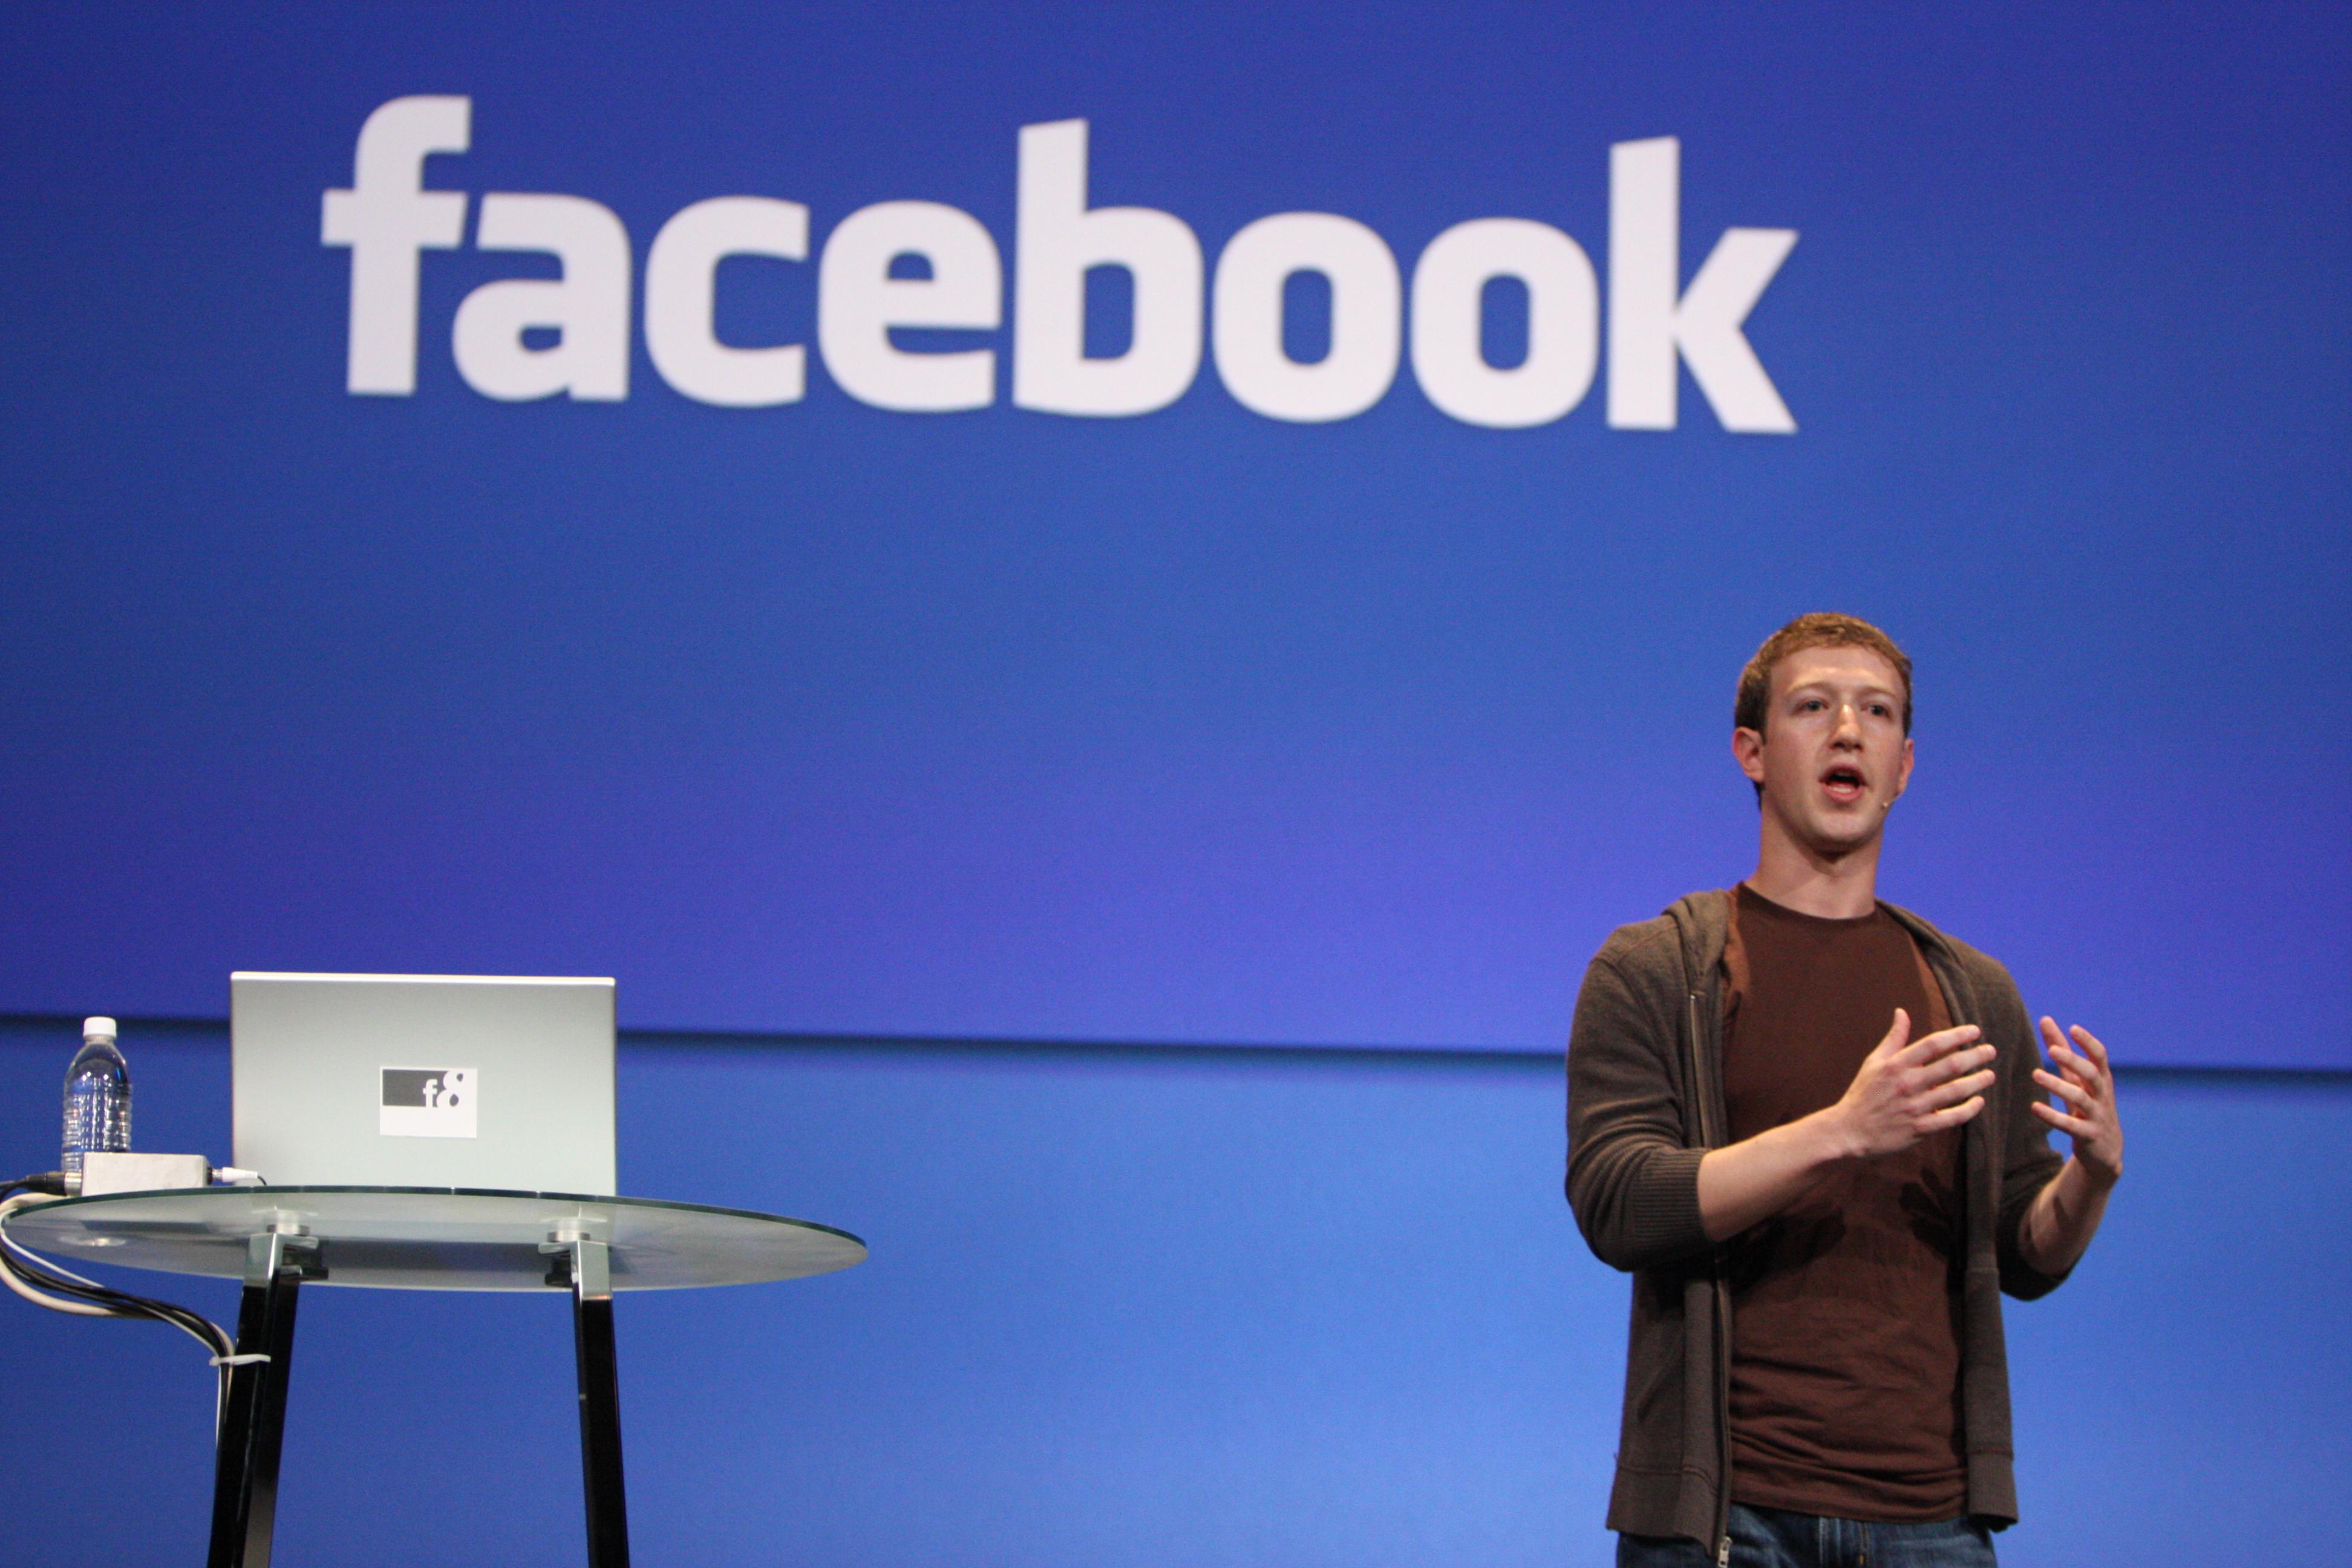 jefes, mark zuckerberg, facebook, empleo, líderes